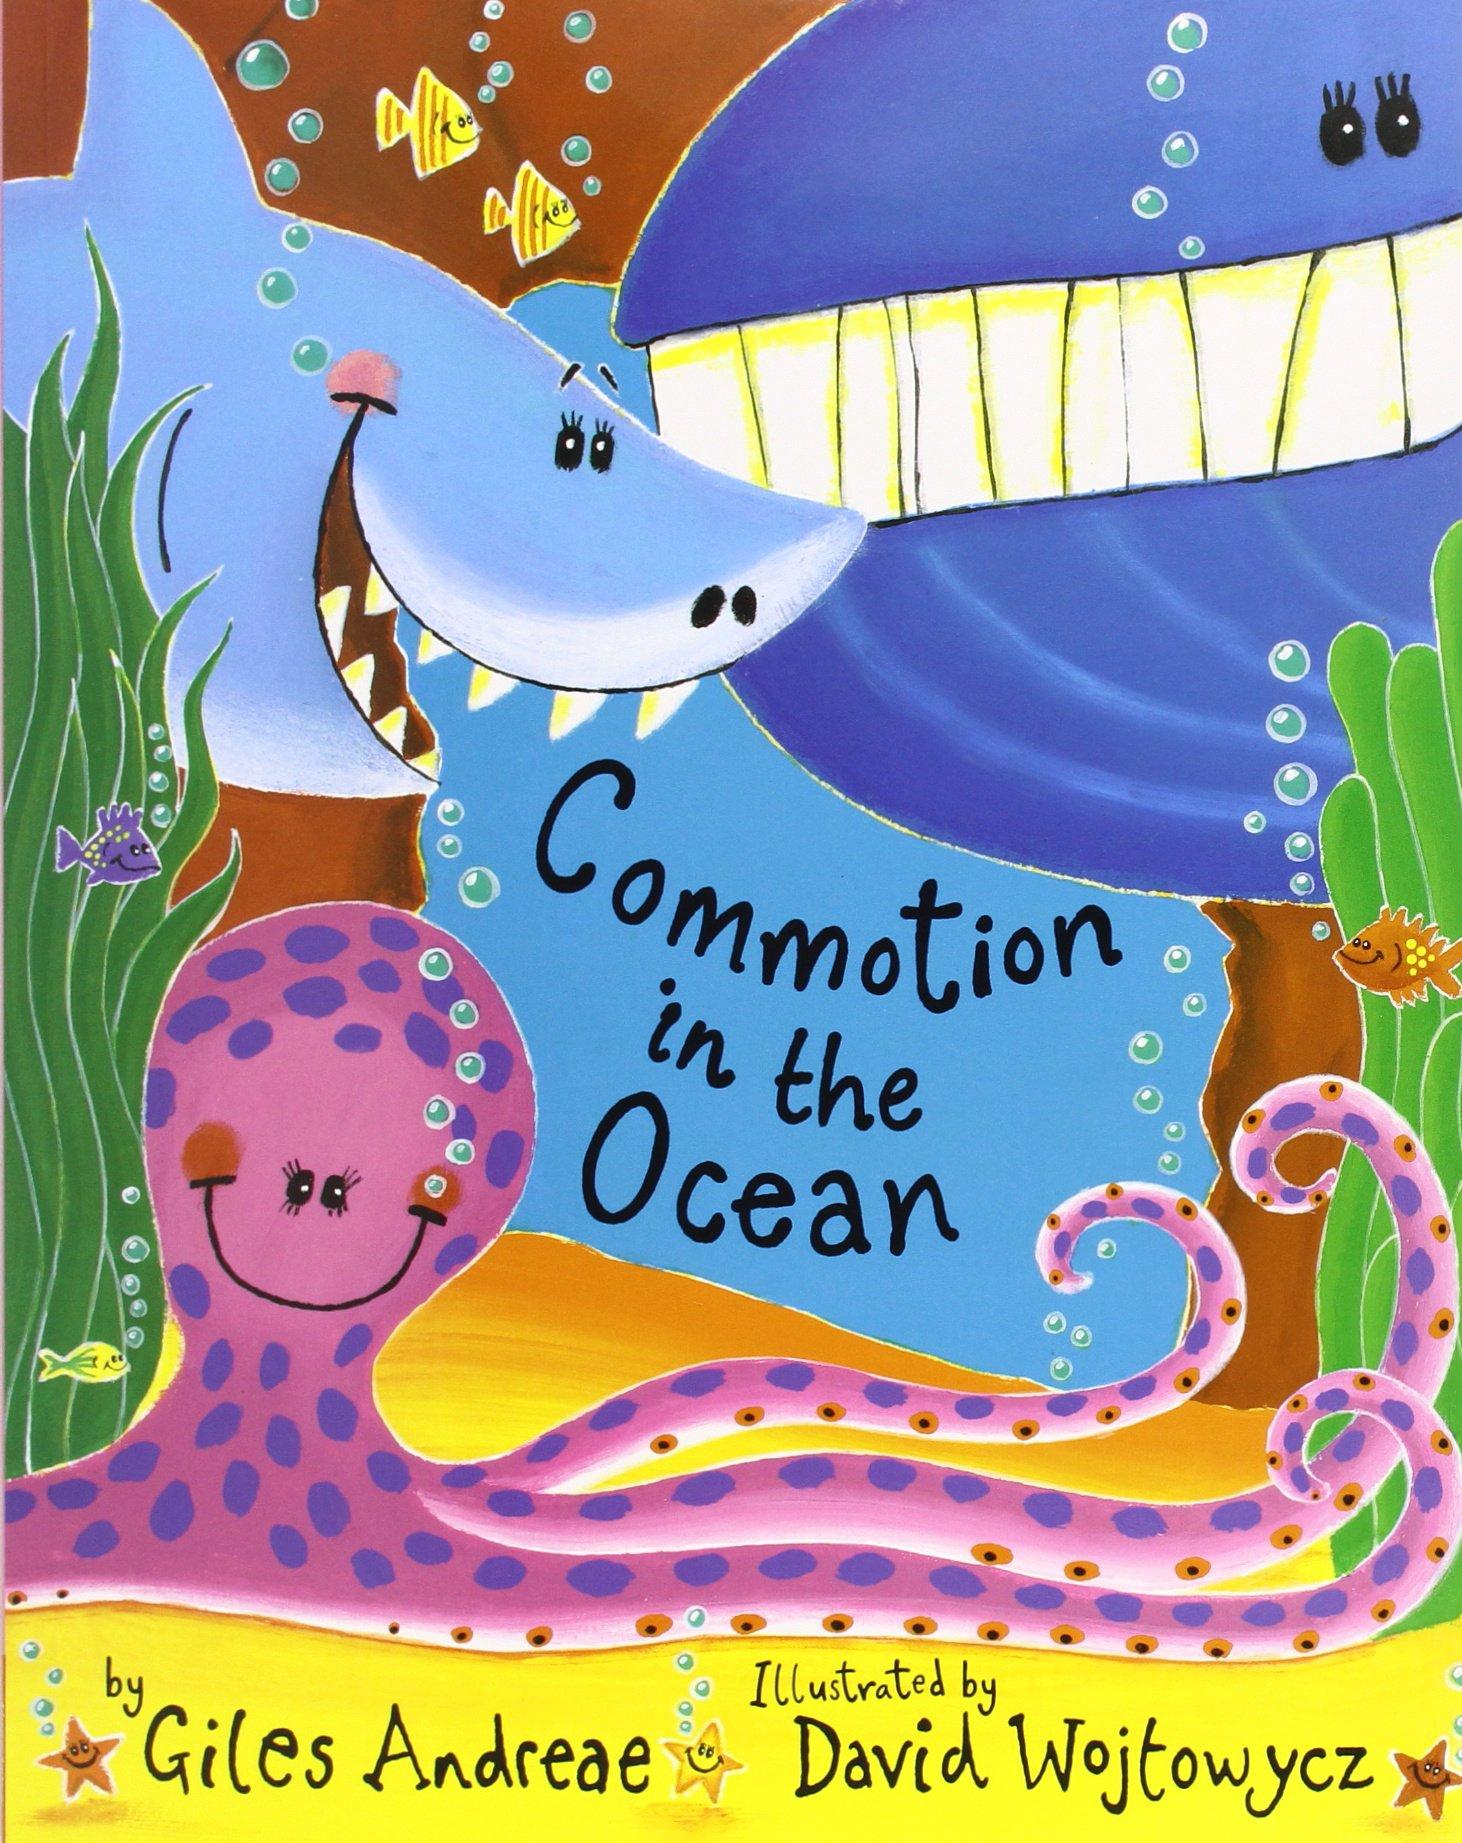 ocean commotion in the ocean